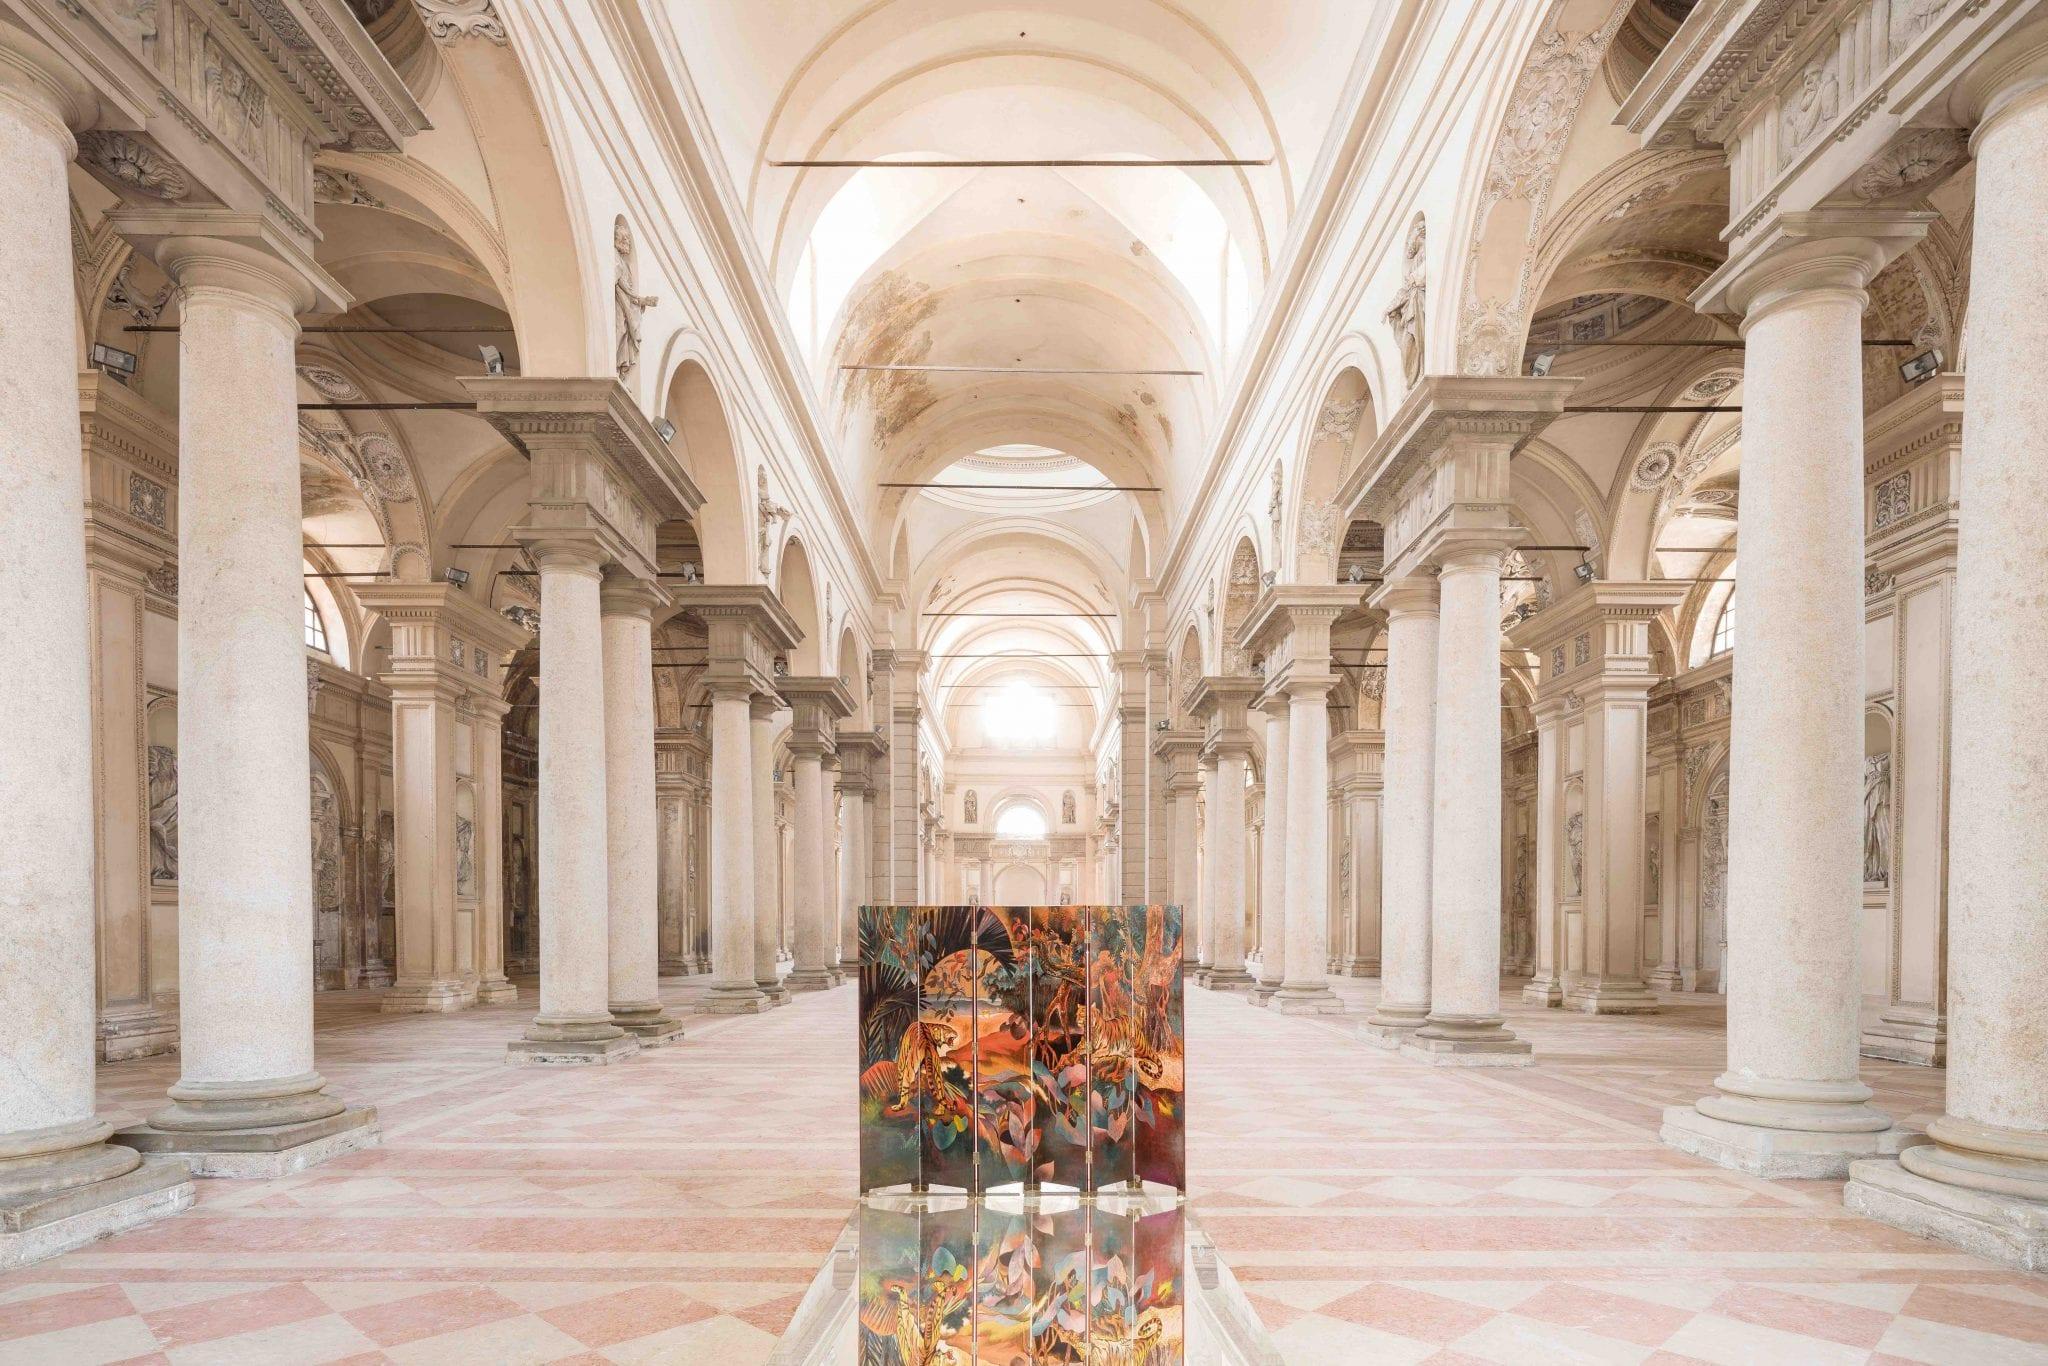 Volumnia. A Piacenza il design incontra l'arte, in una chiesa sconsacrata